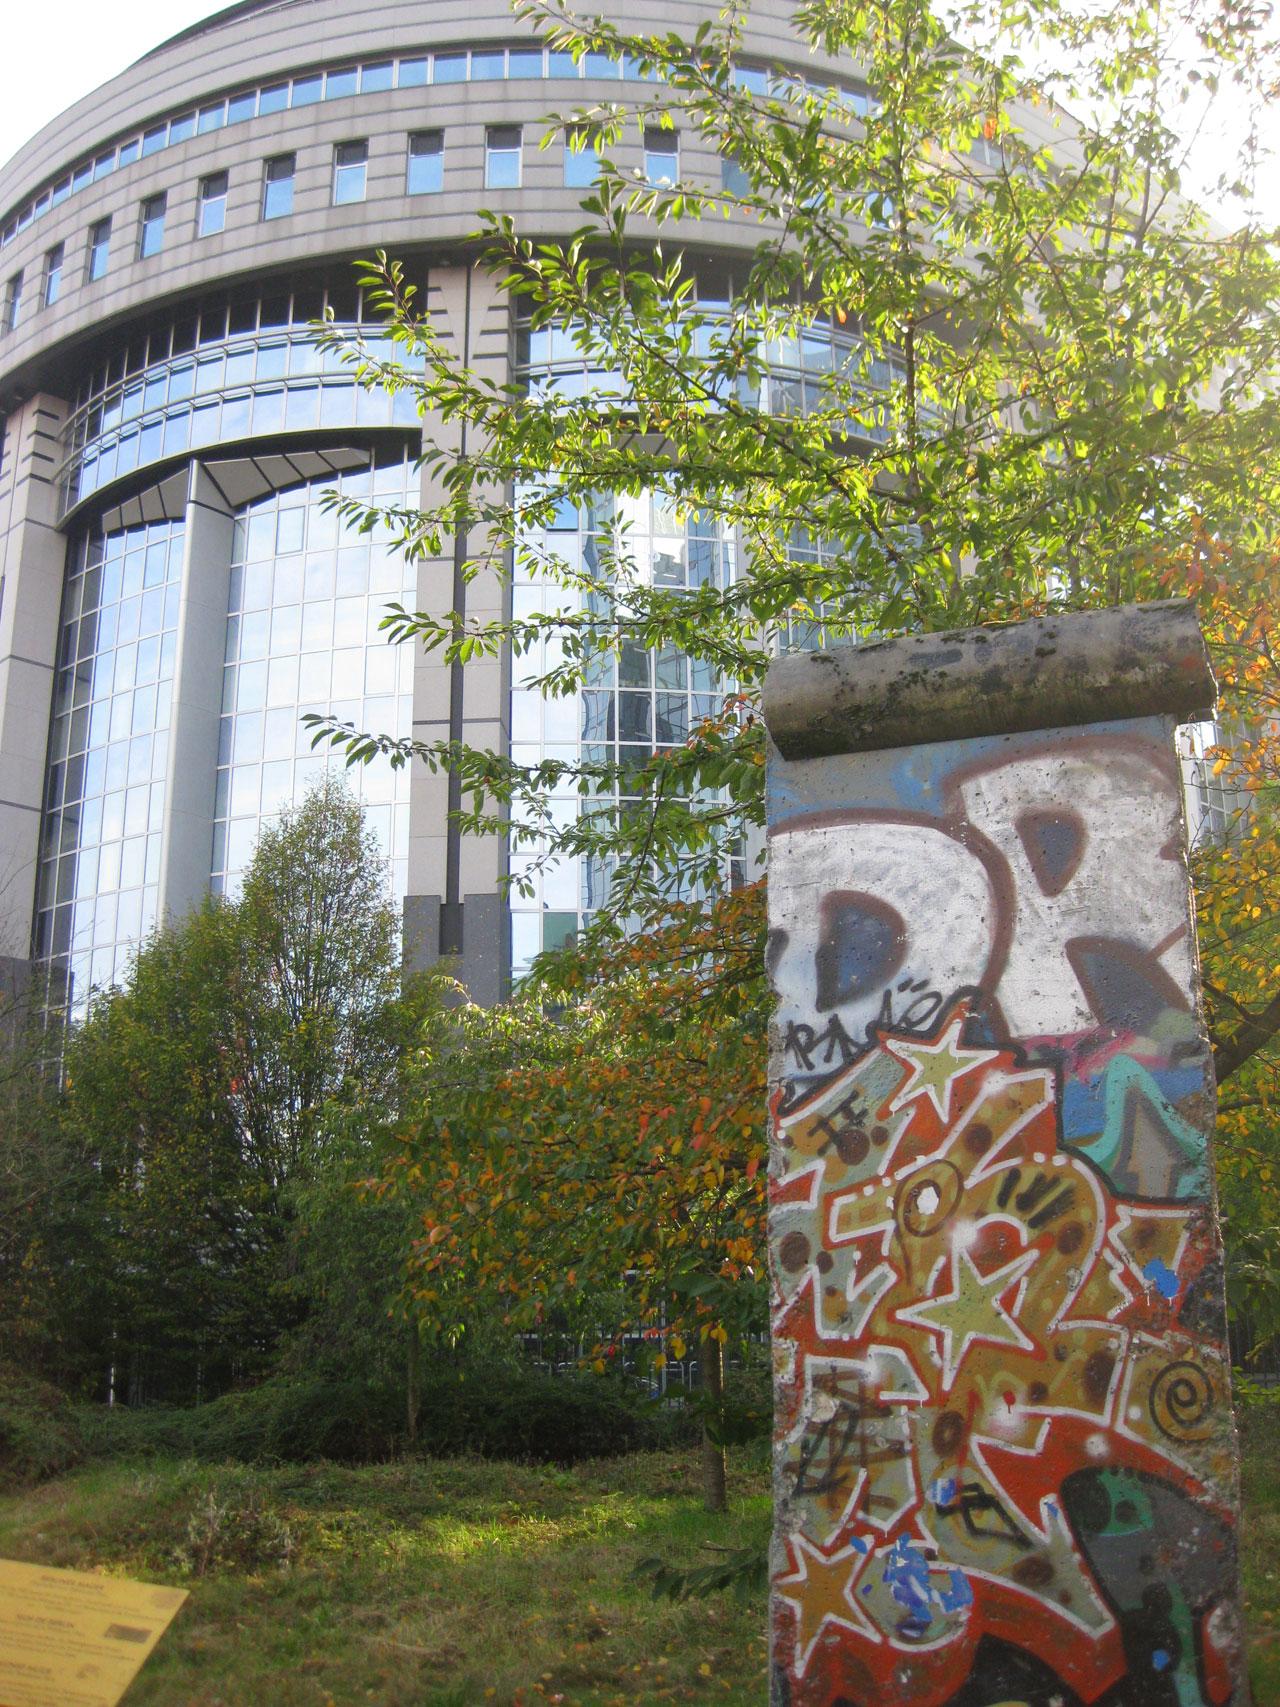 European Parliament and the Berlin Wall, Brussels, Belgium